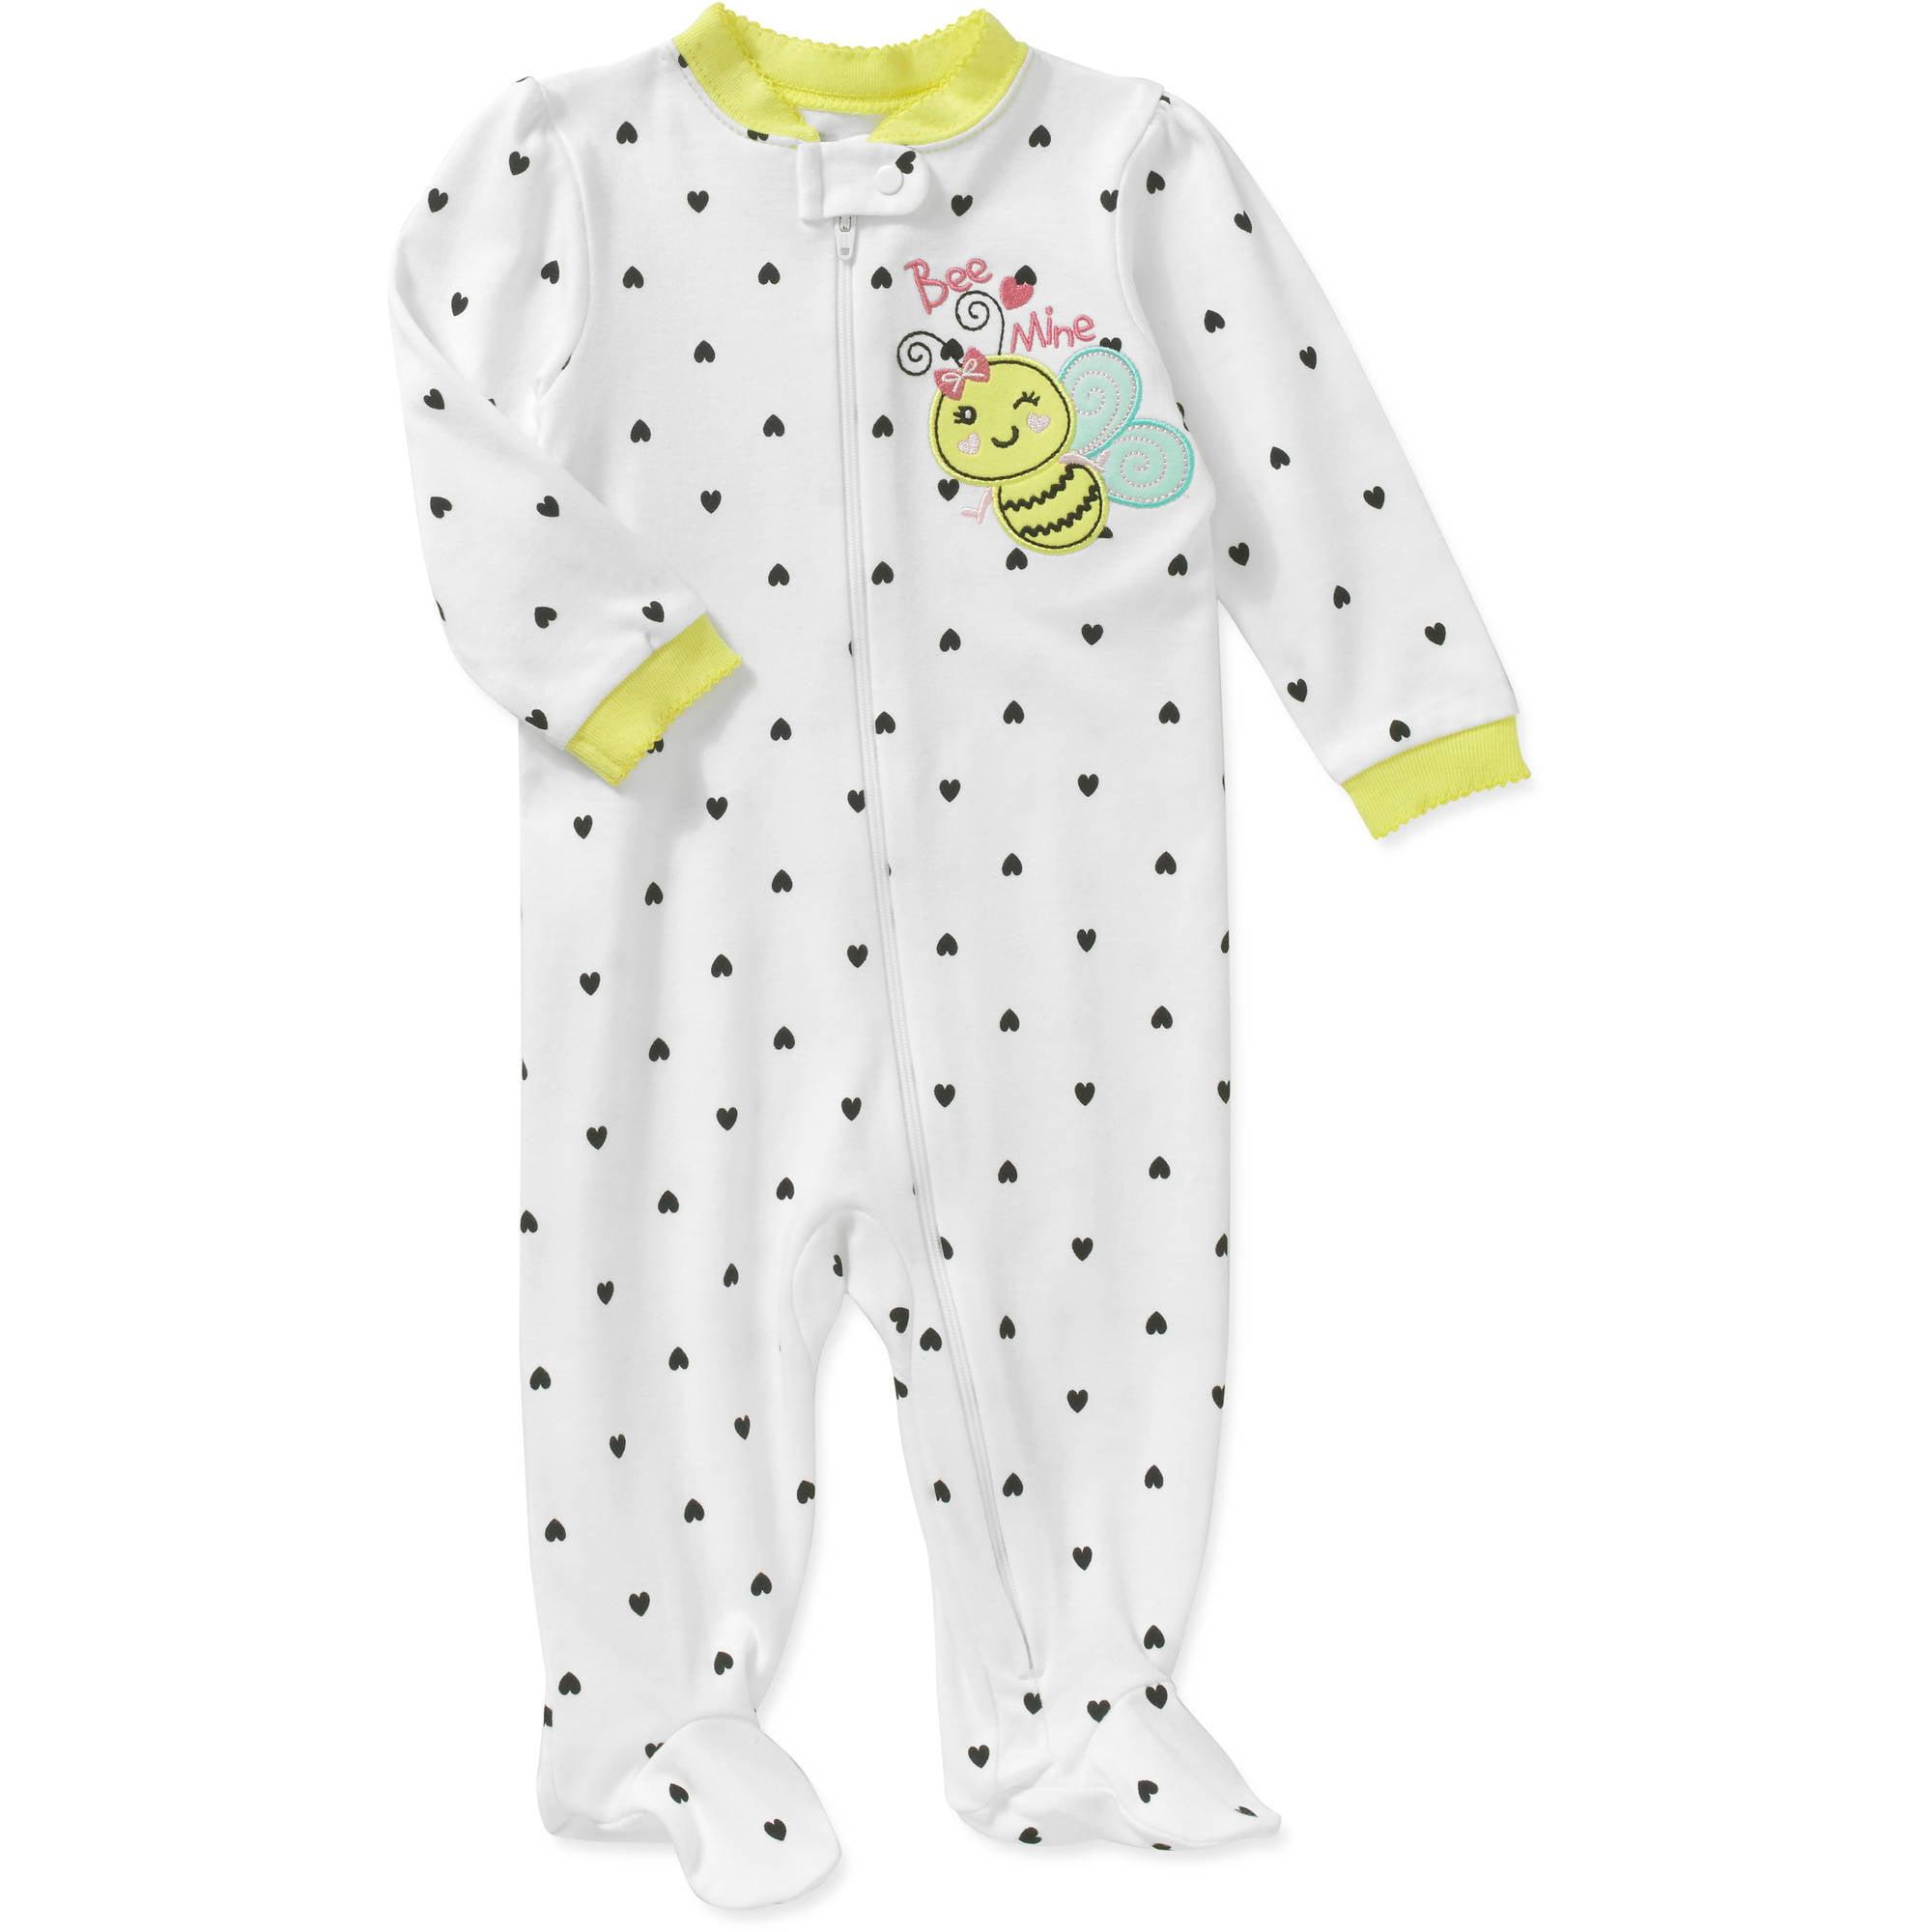 Garanimals Newborn Baby Girl Cotton Sleep N Play Walmart Com